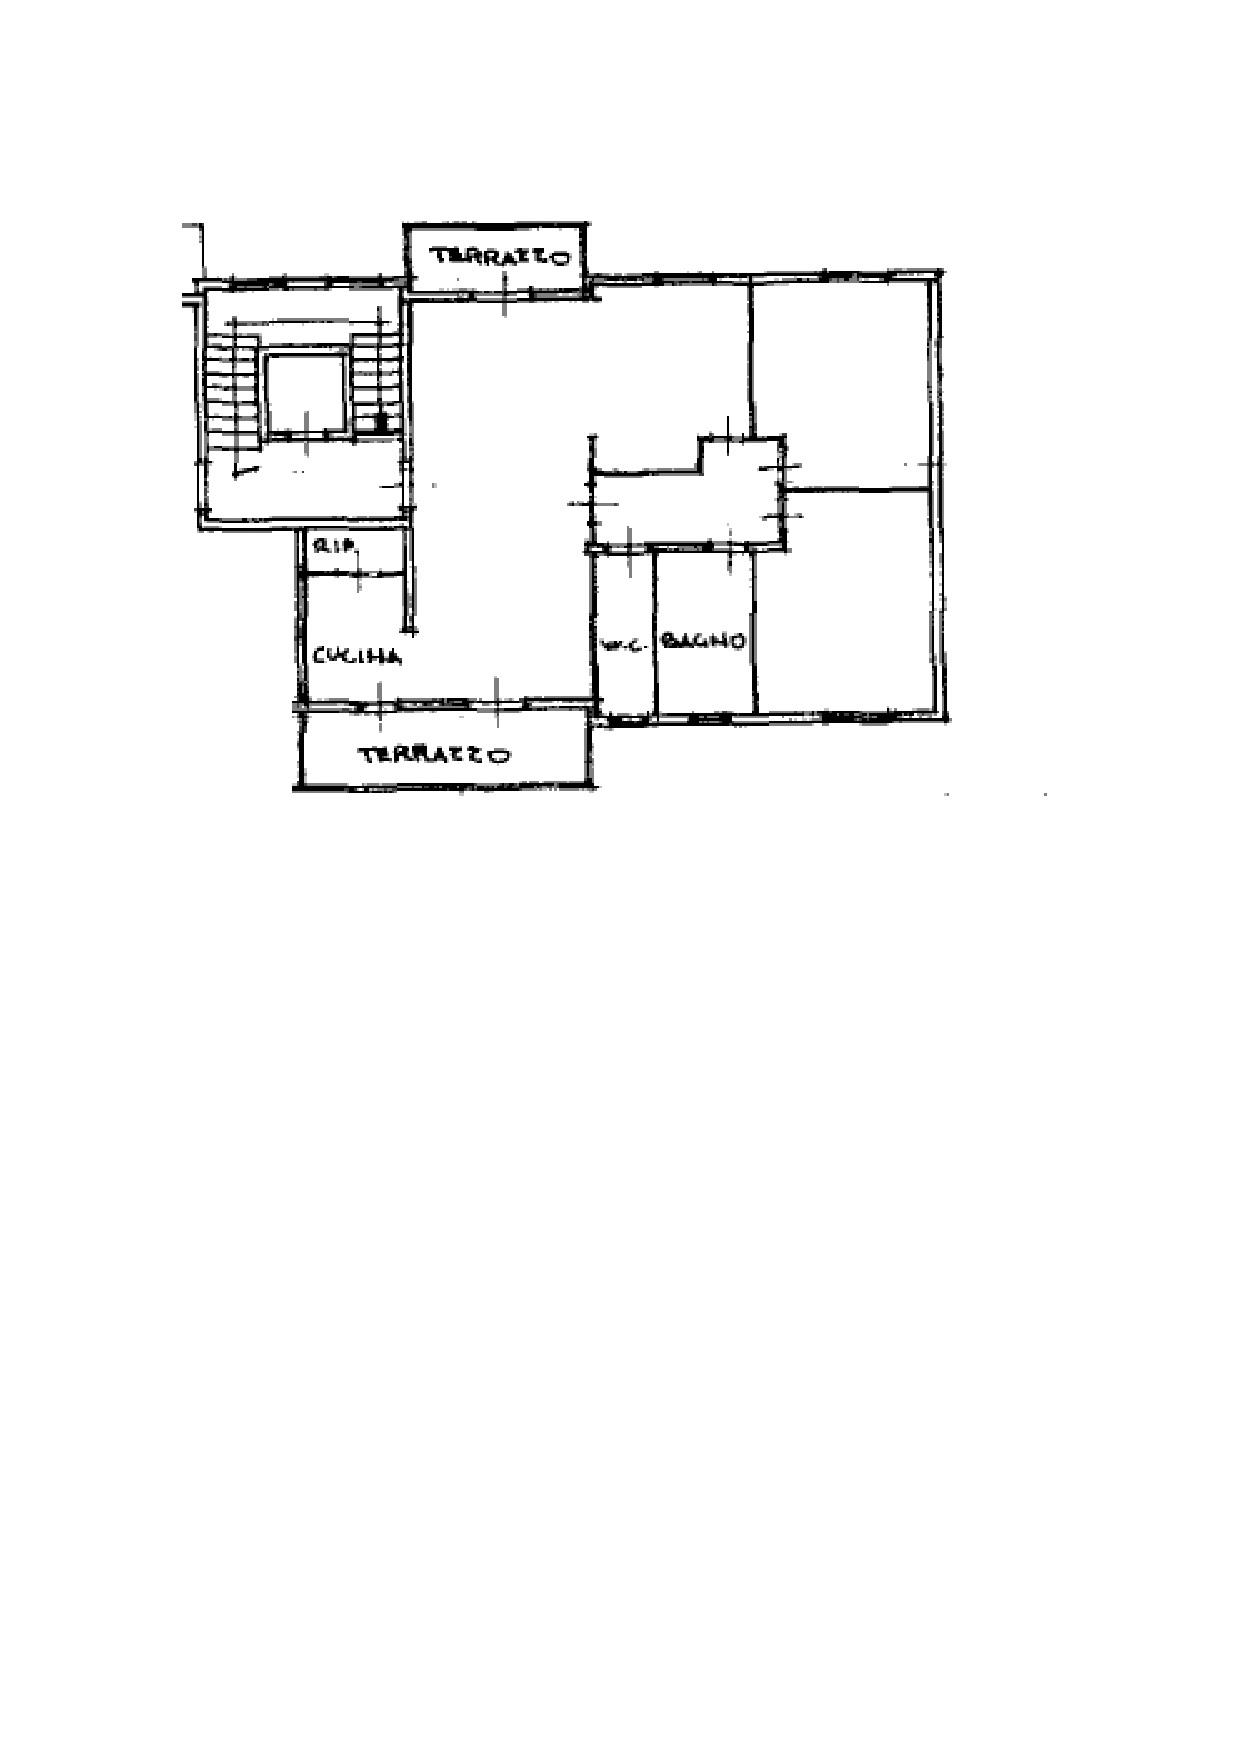 Appartamento in vendita, rif. K132 (Planimetria 1/1)